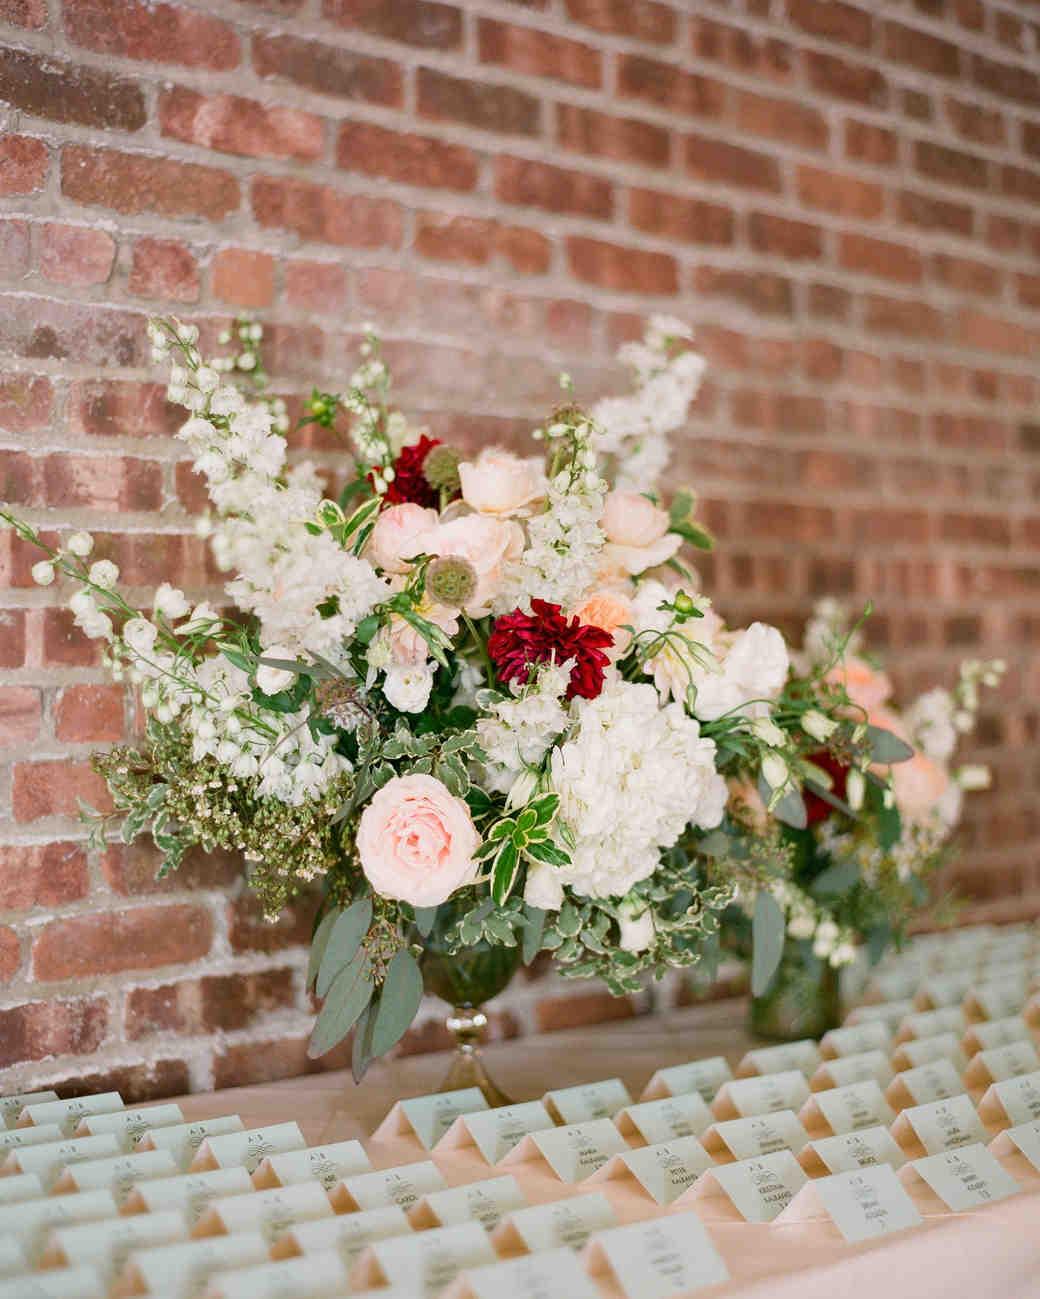 amy-bob-wedding-escortcards-0717-s111884-0715.jpg